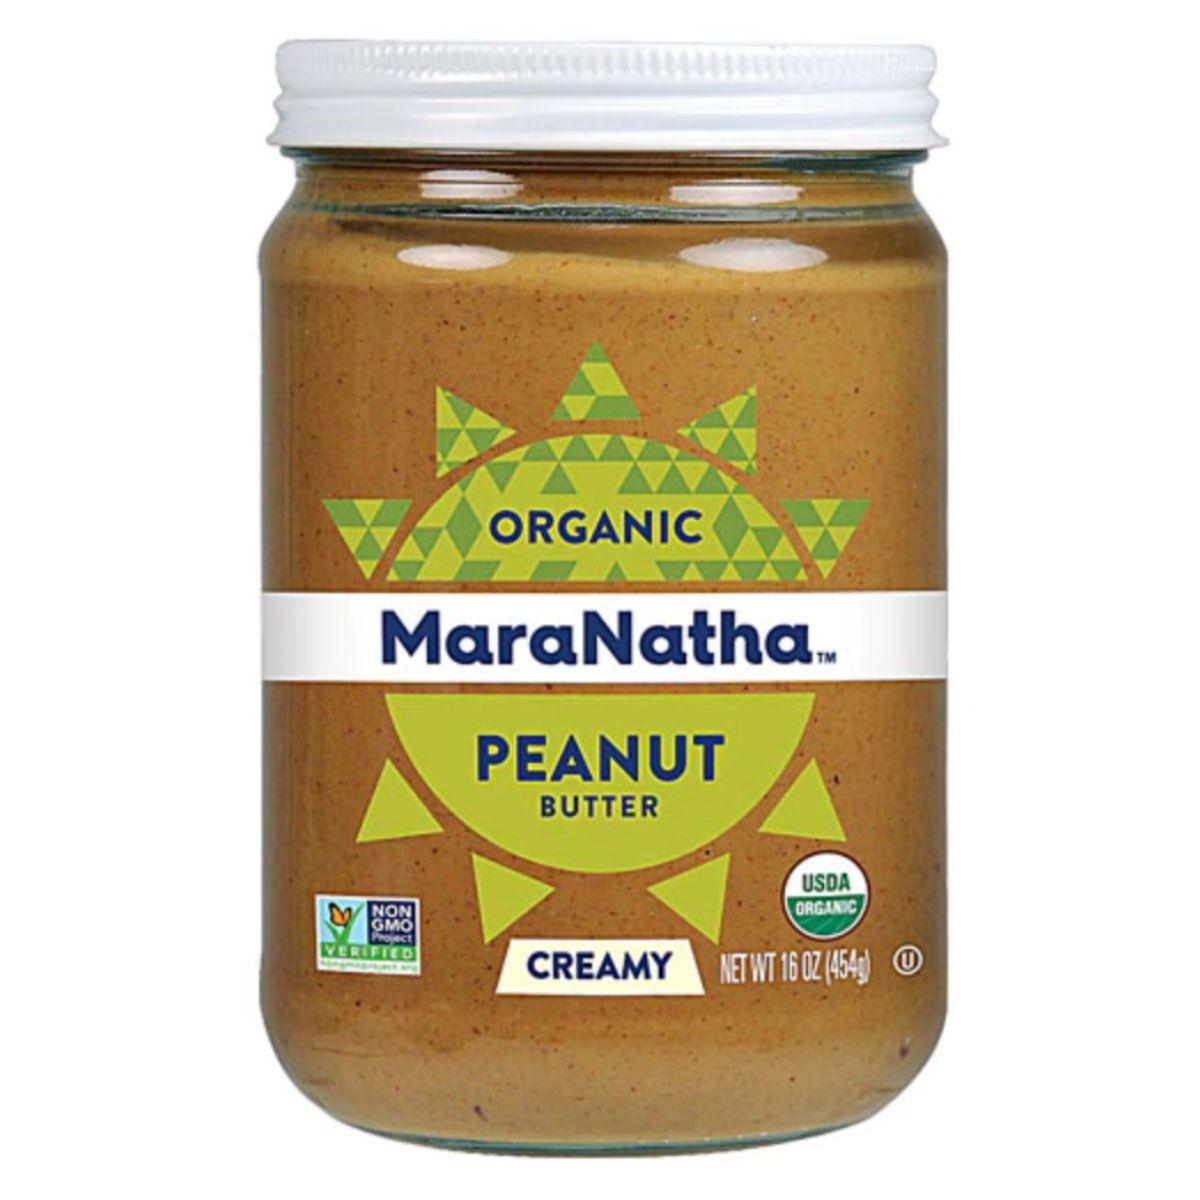 Maranatha Creamy Peanut Butter